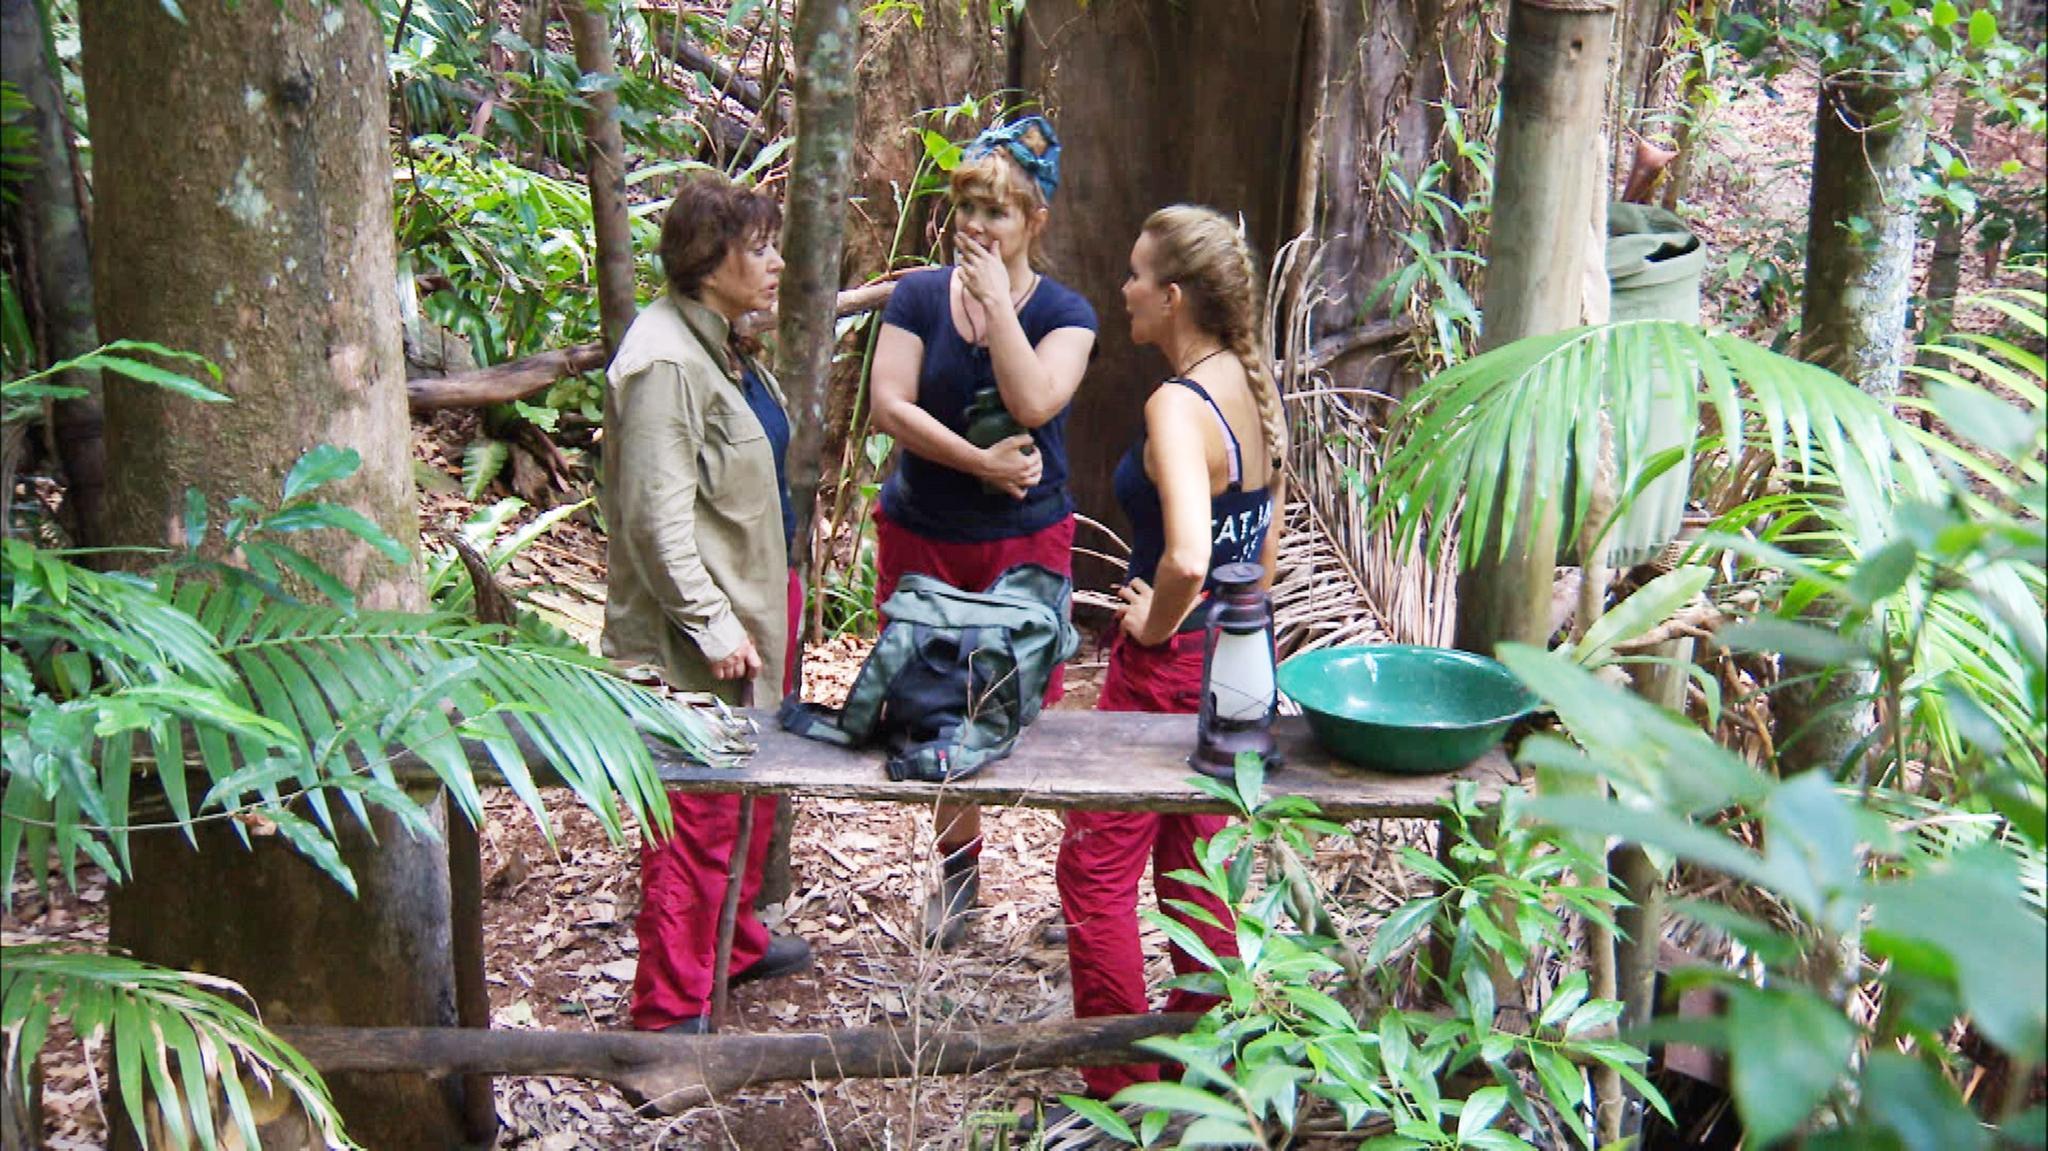 Tina York, Sandra Steffl und Tatjana Gsell im Gespräch